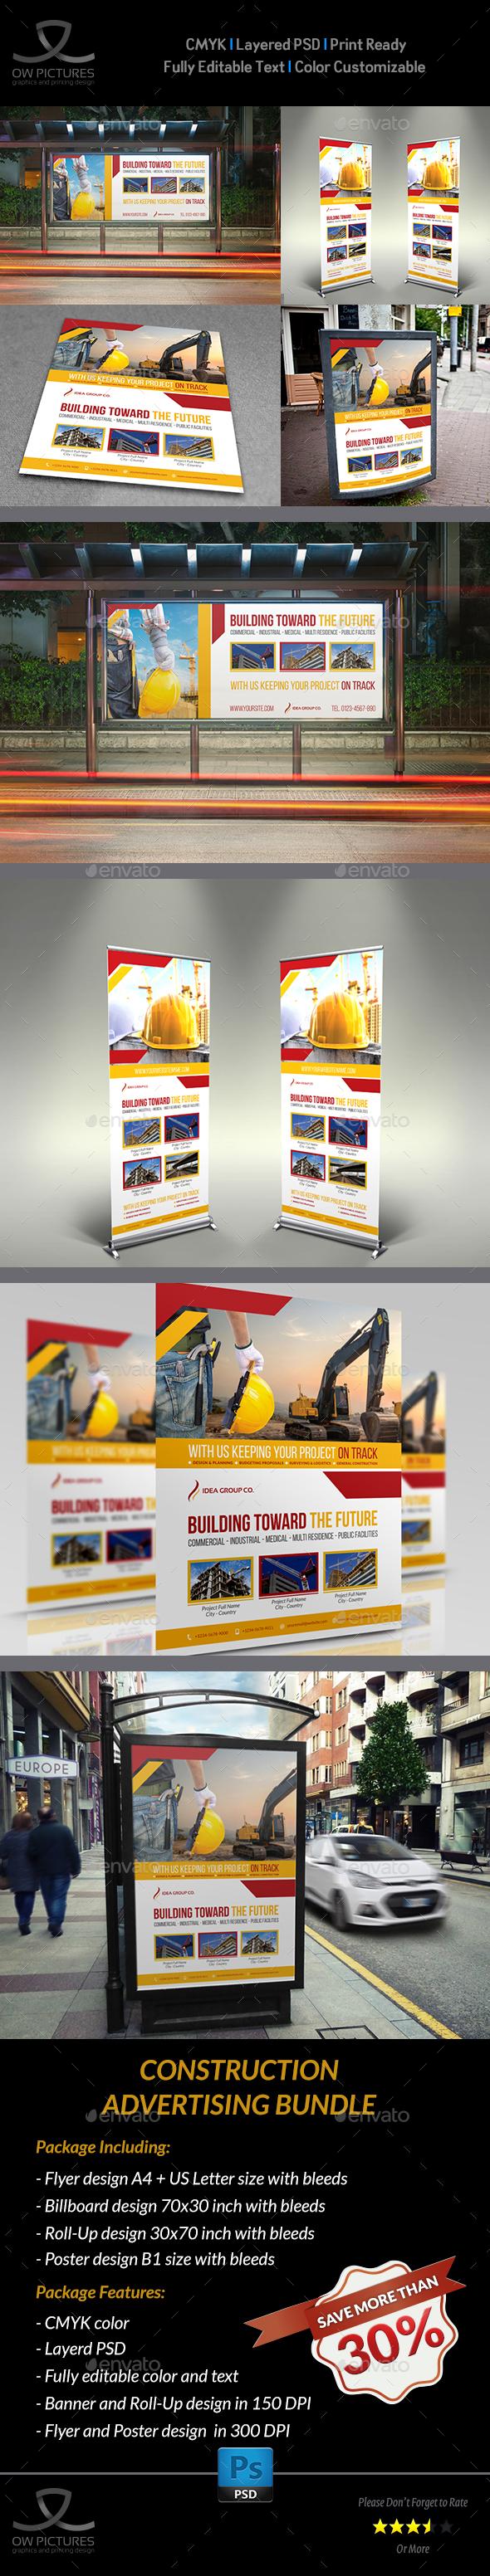 Construction Advertising Bundle Vol.5 - Signage Print Templates